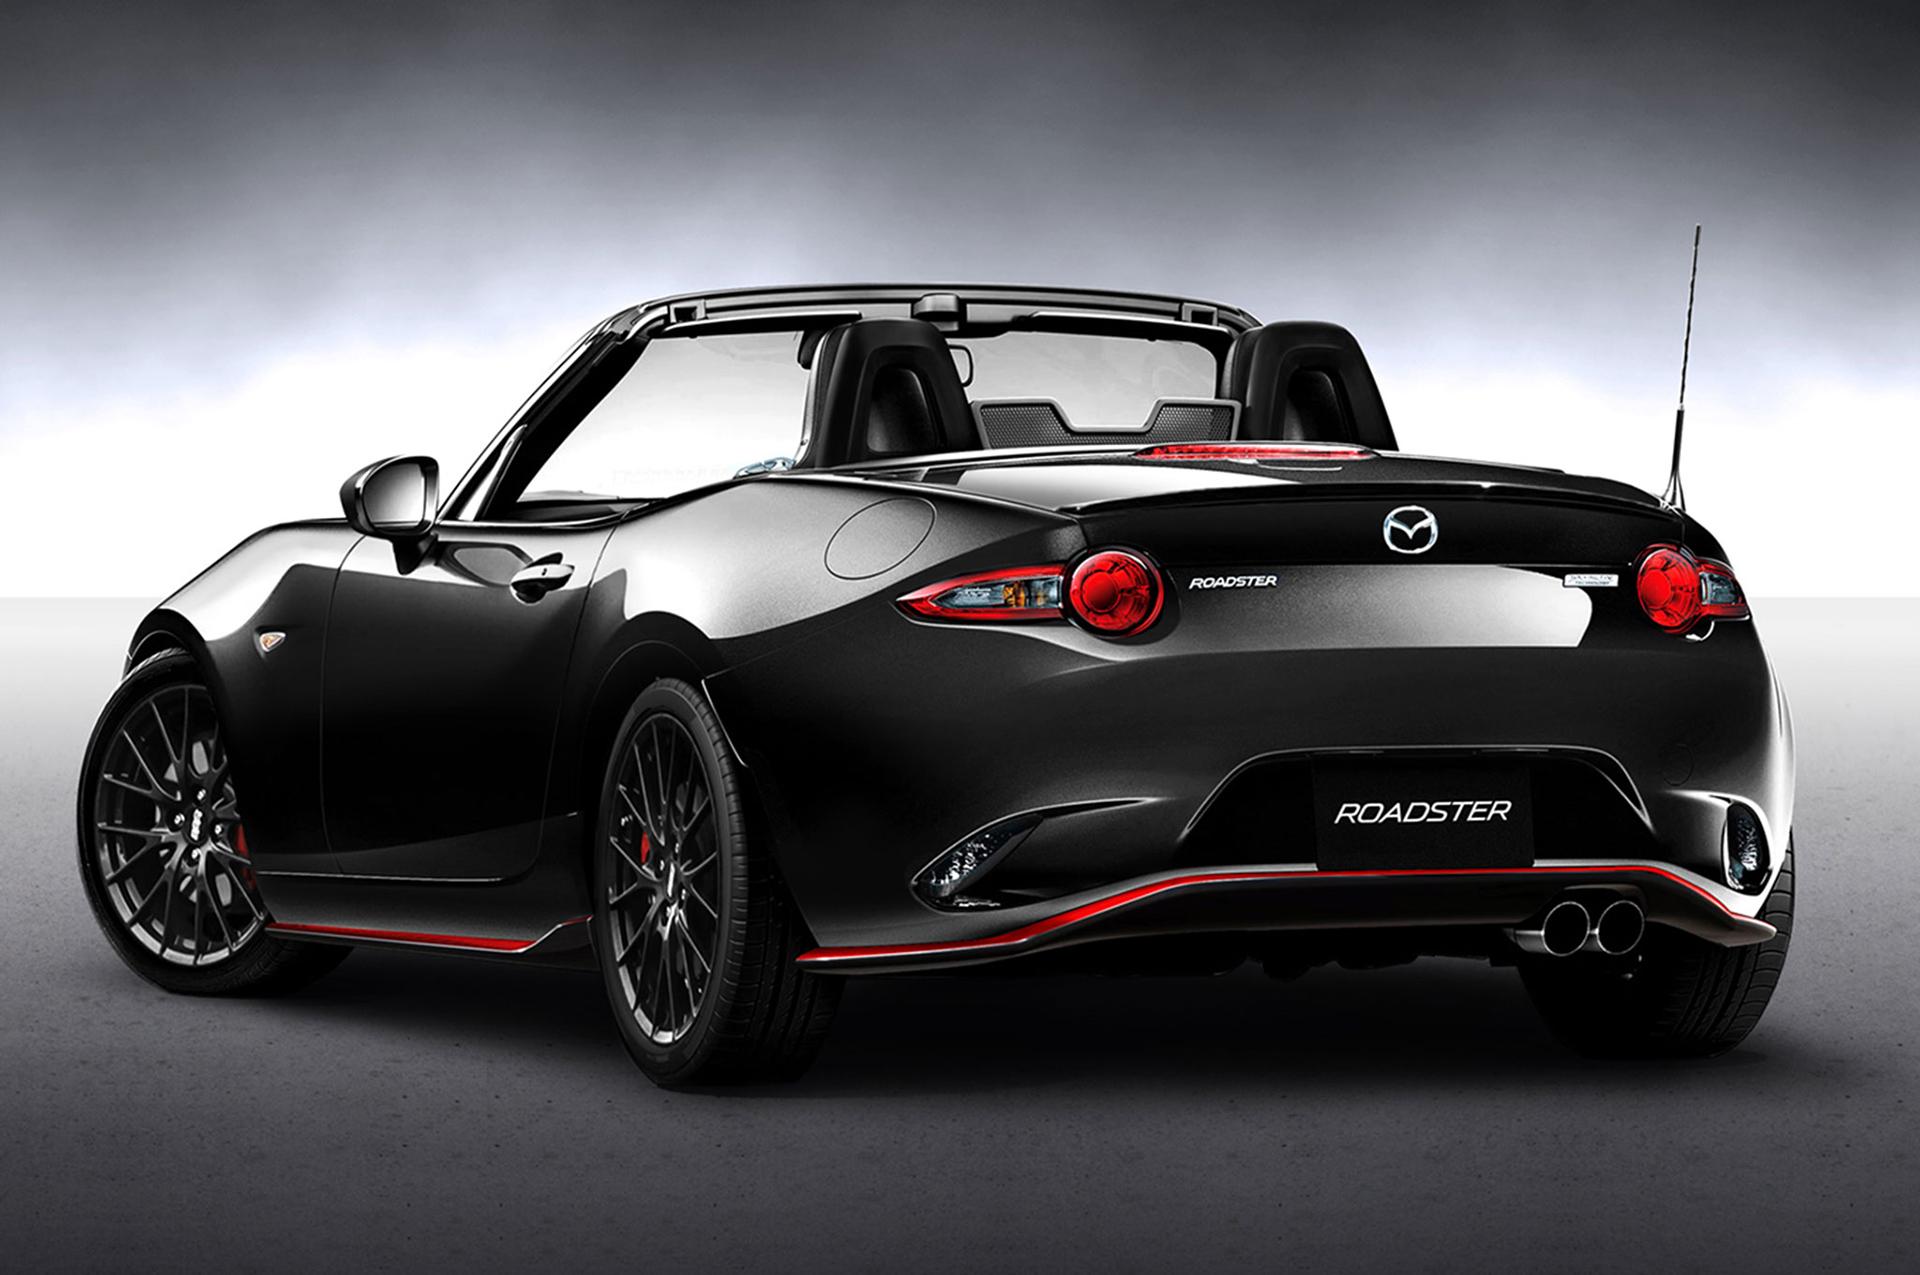 Mazda MX-5 Racing Concept - Tokyo Auto Salon 2016 - arrière / rear